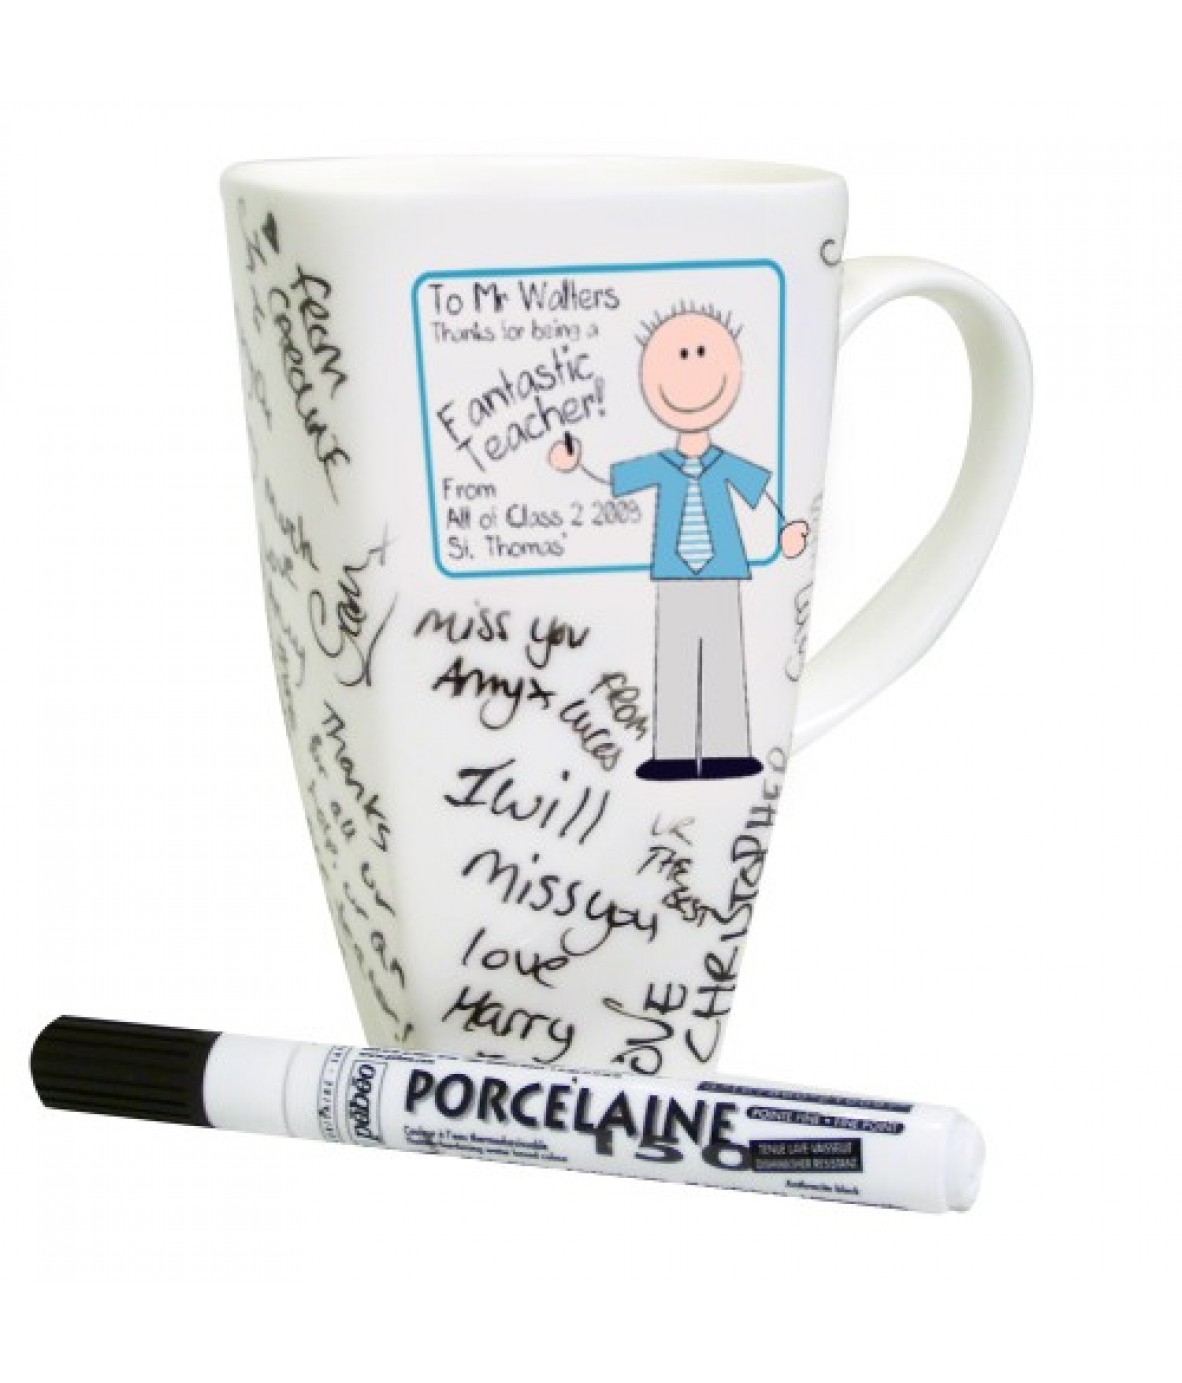 Personalized mugs cheap uk - Personalised Blue Teachers Whiteboard Message Mug Loading Zoom